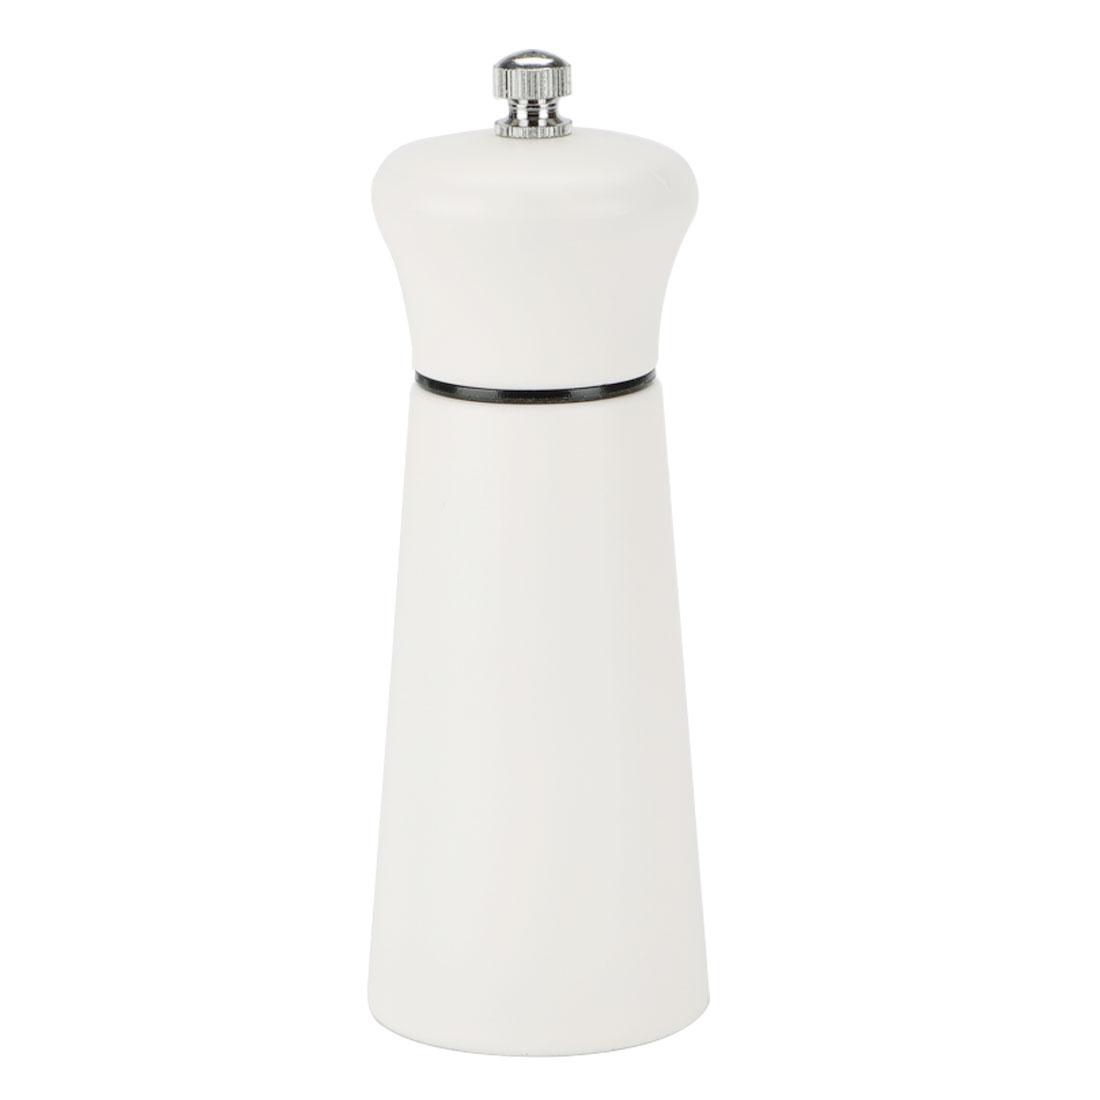 "5.5"" Wooden Salt and Pepper Grinder Hand Shaker with Adjustable Coarseness White"